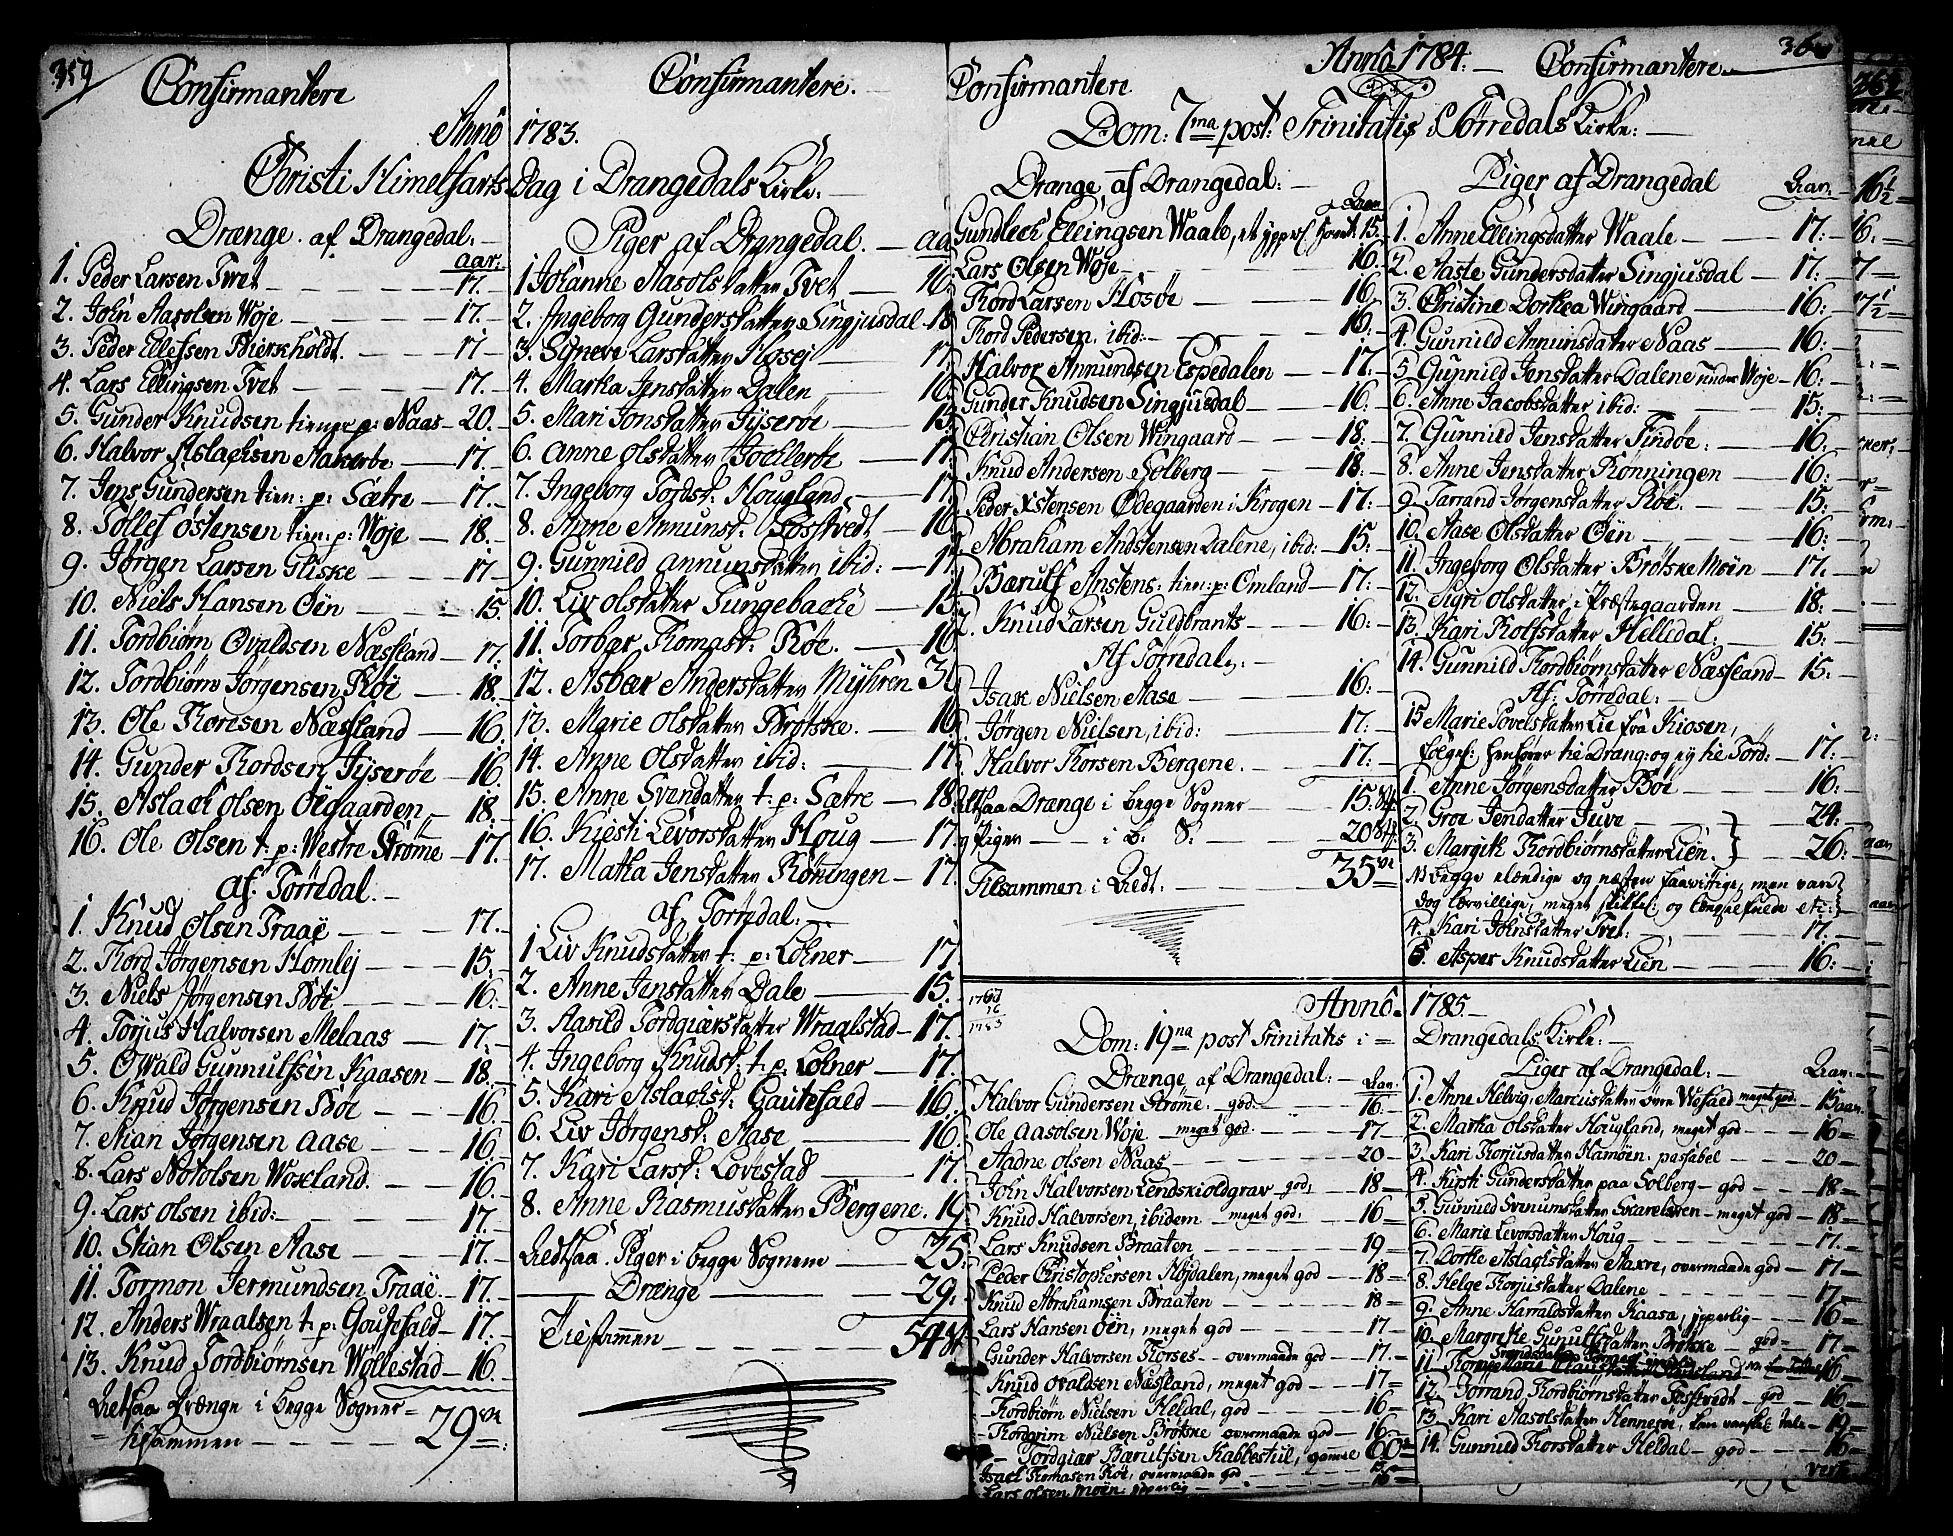 SAKO, Drangedal kirkebøker, F/Fa/L0003: Ministerialbok nr. 3, 1768-1814, s. 359-360